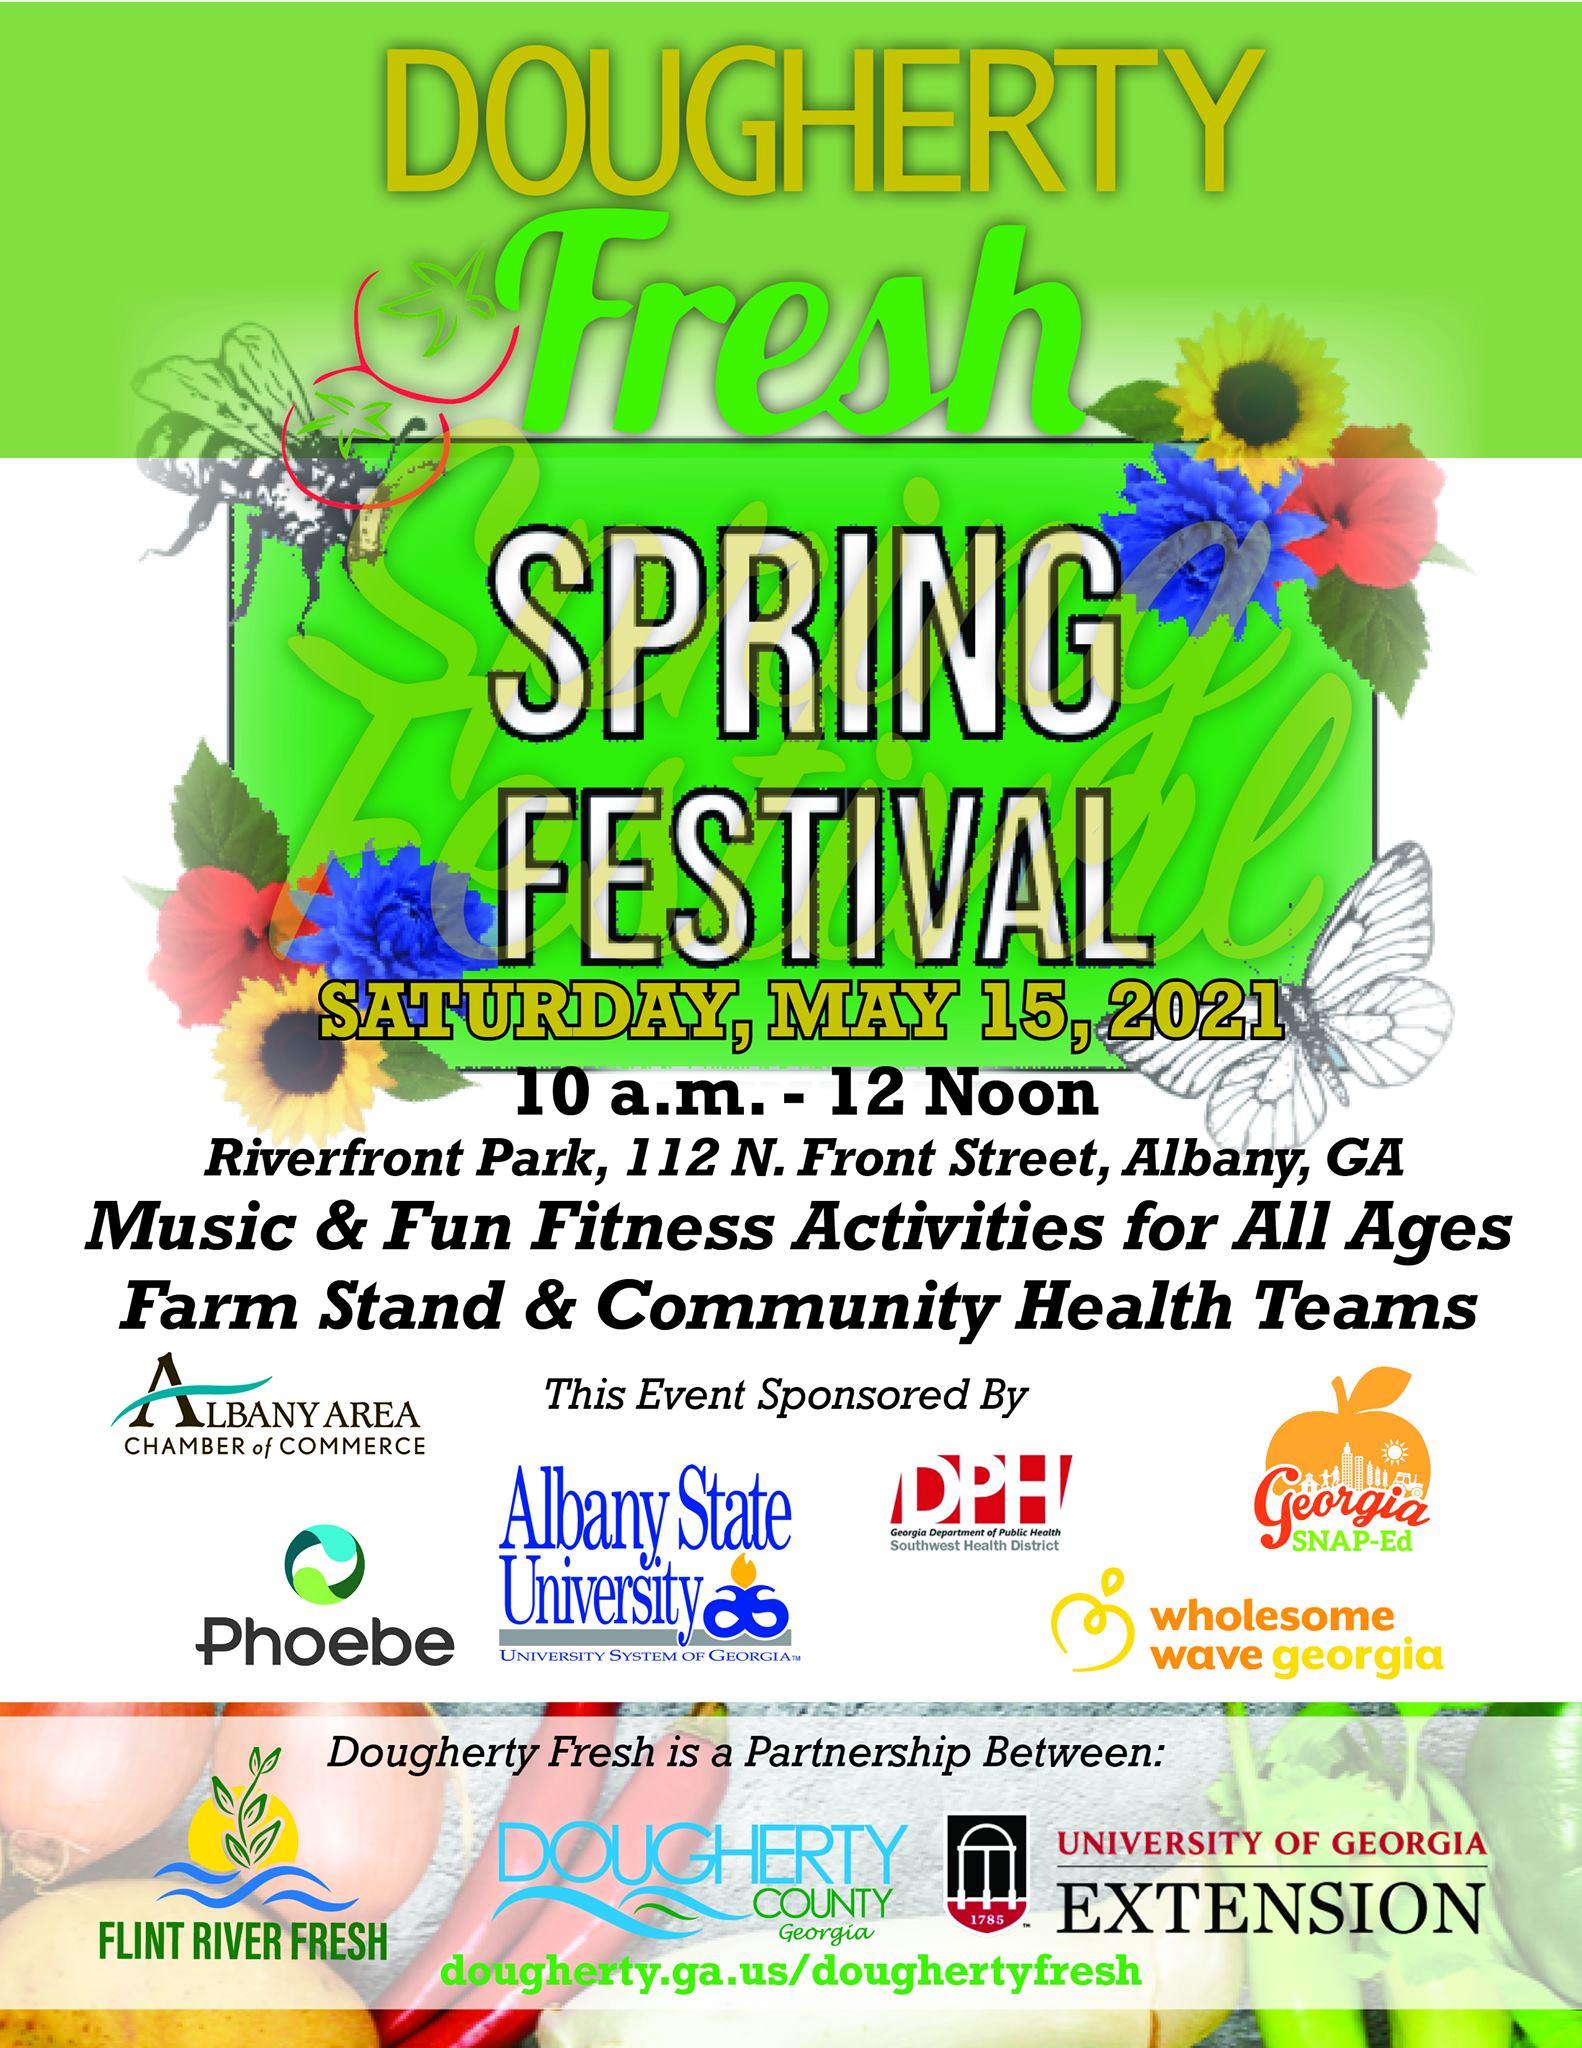 Spring Market Festival